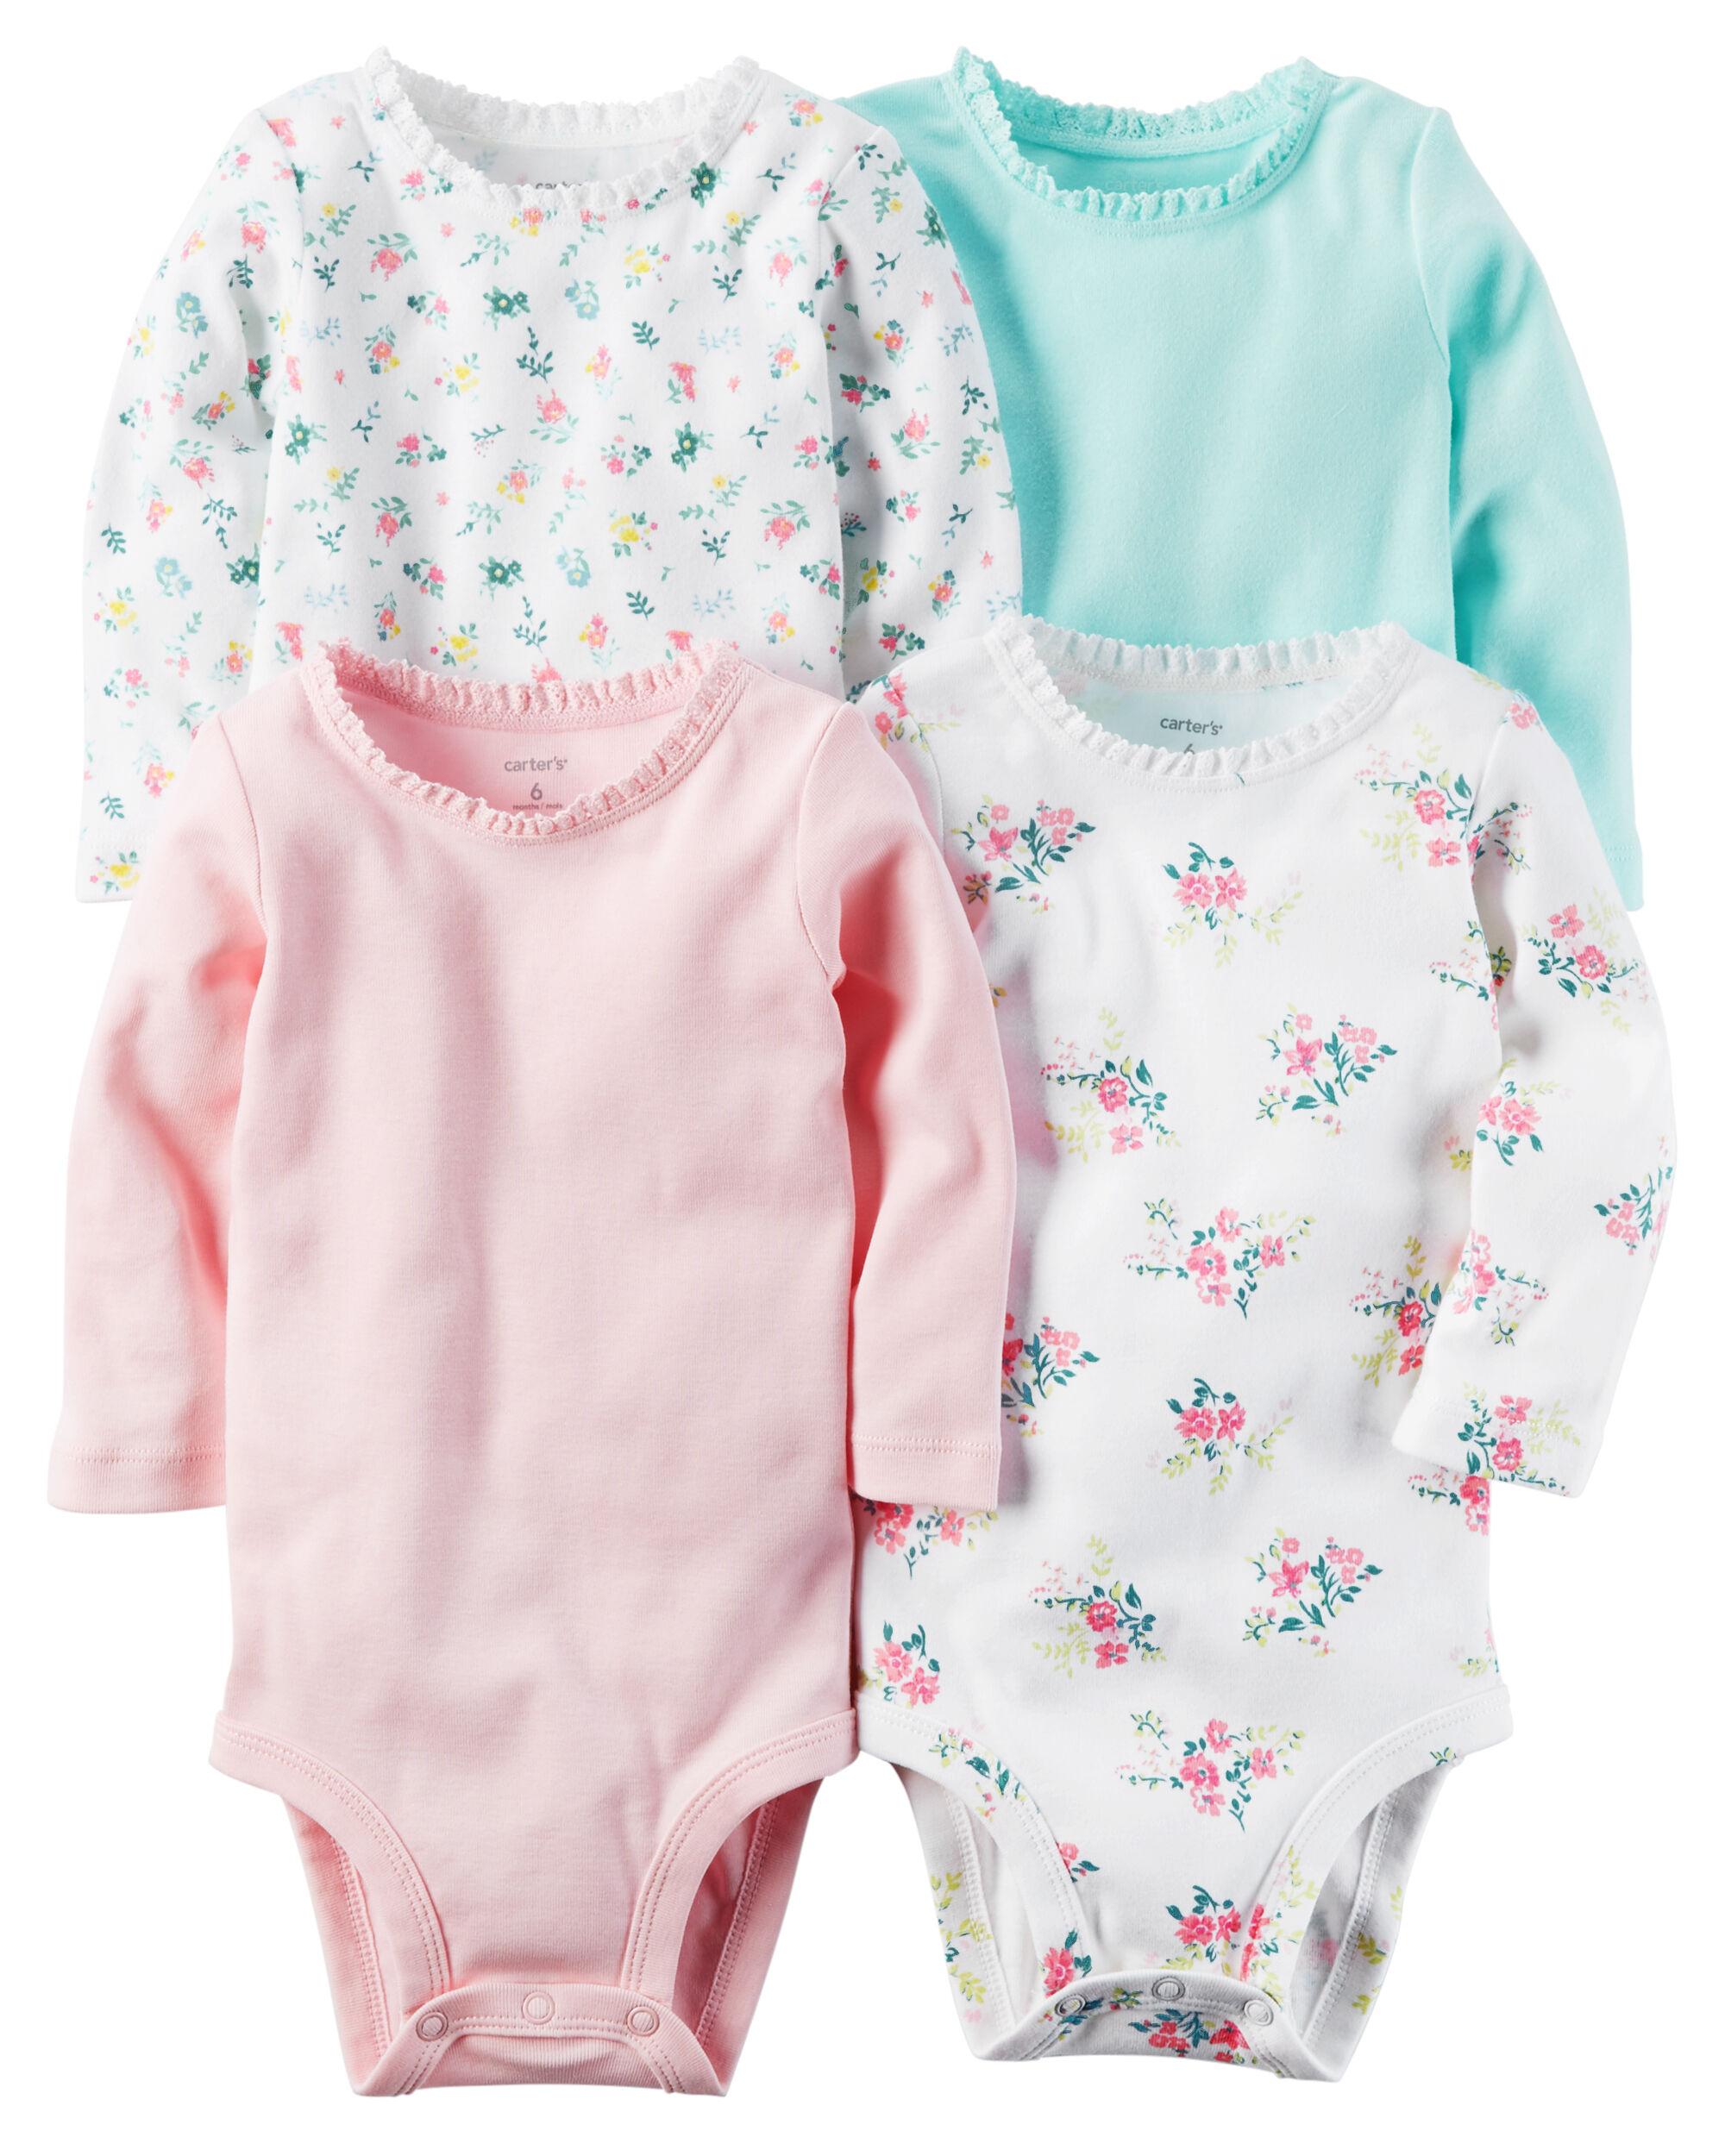 Newborn Girl Clothes On Sale